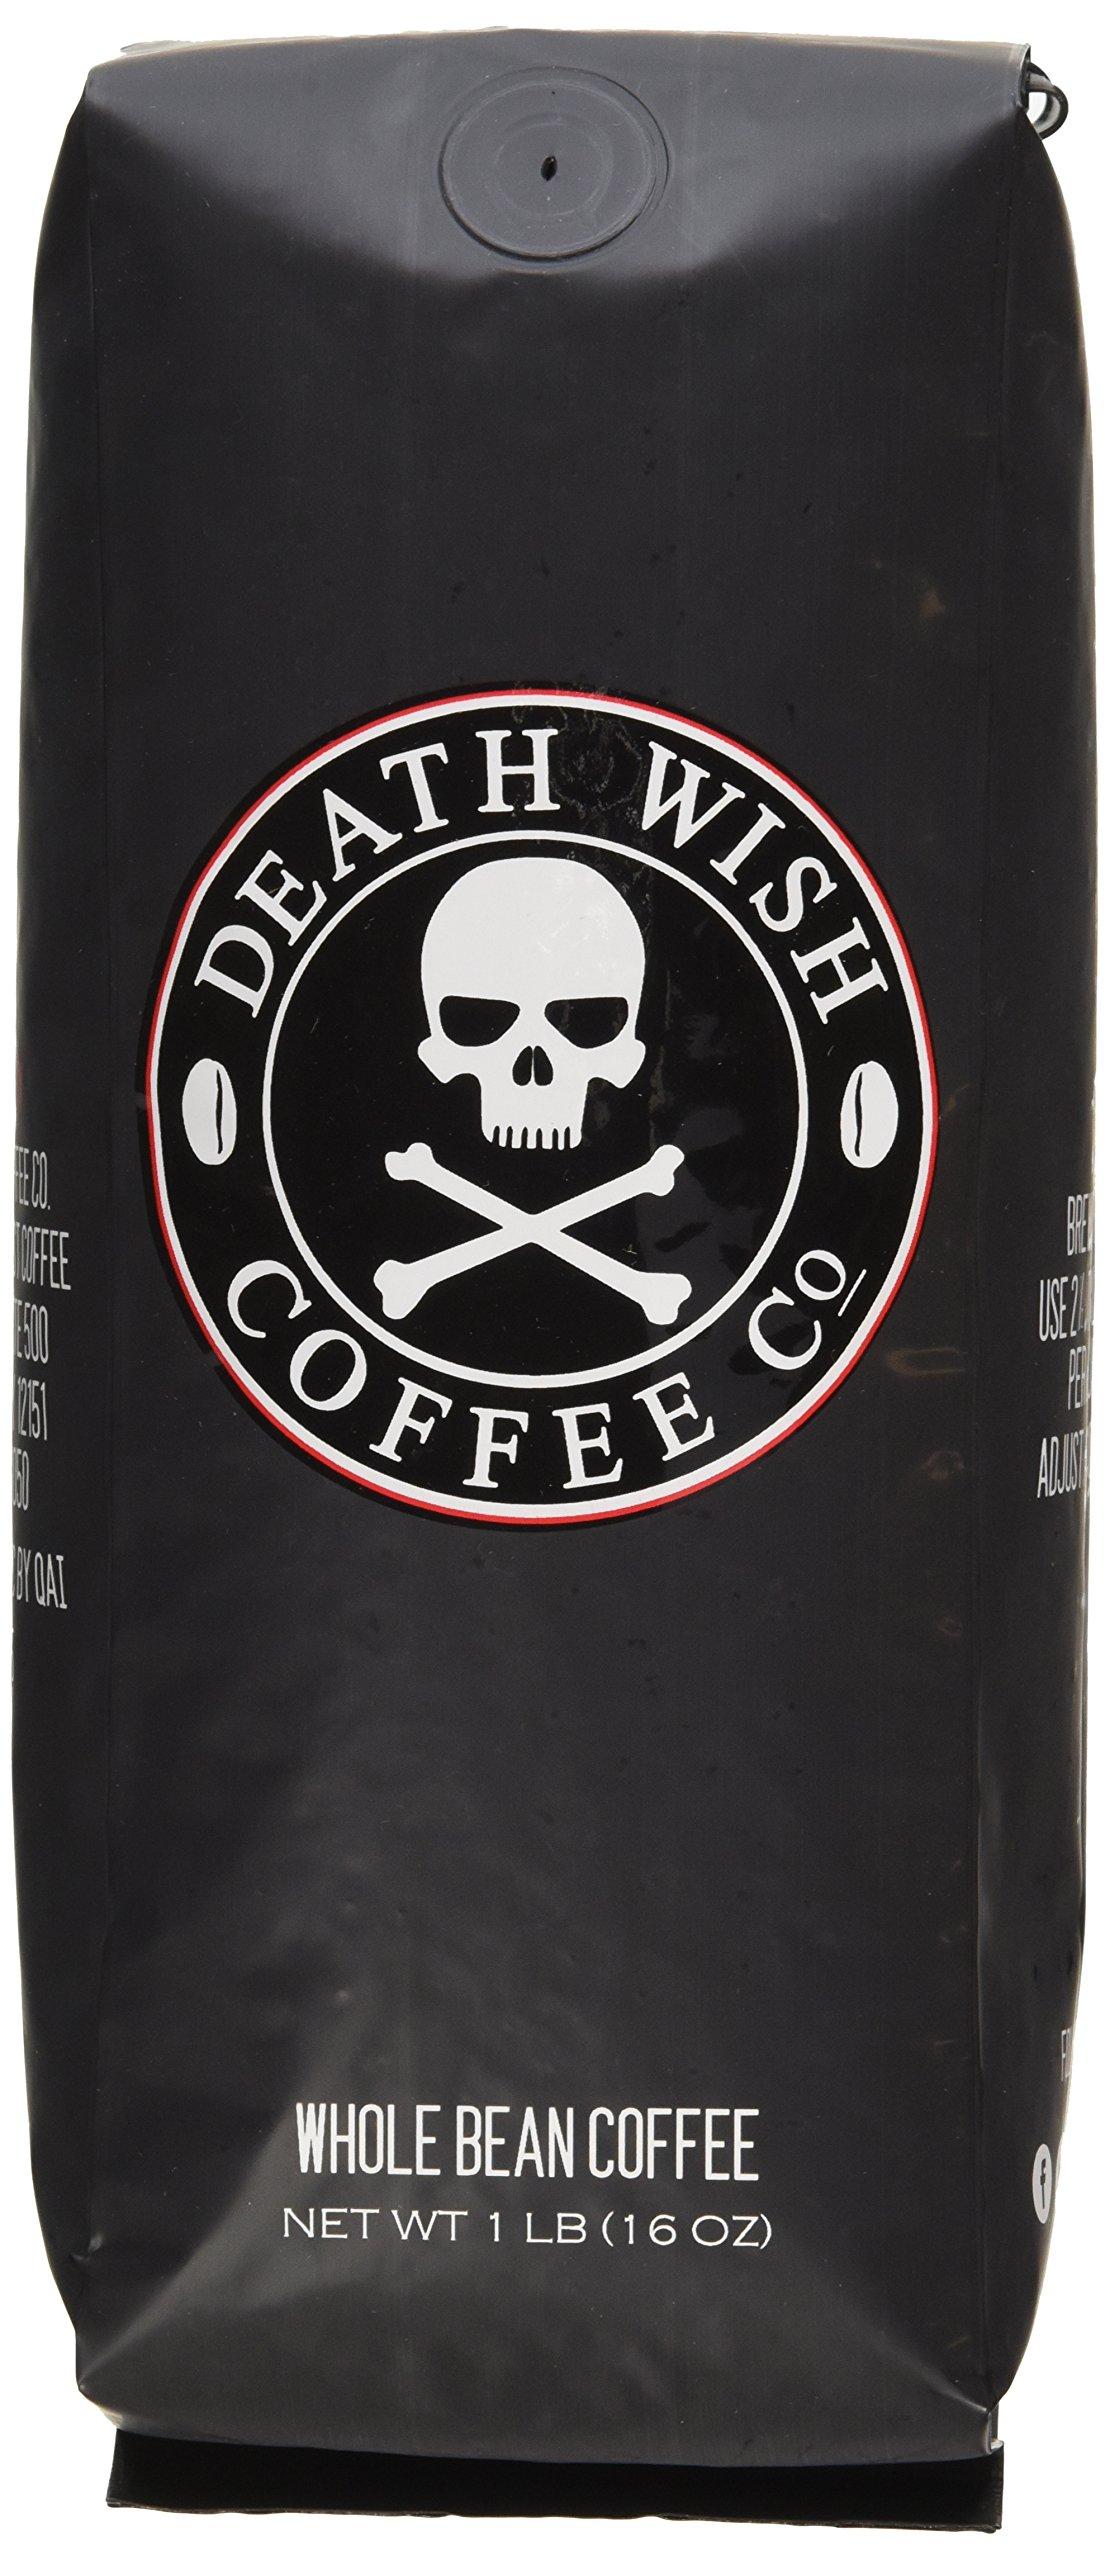 Death Wish Organic USDA Certified Whole Bean Coffee, 16 Ounce Bag by Death Wish Coffee Co.